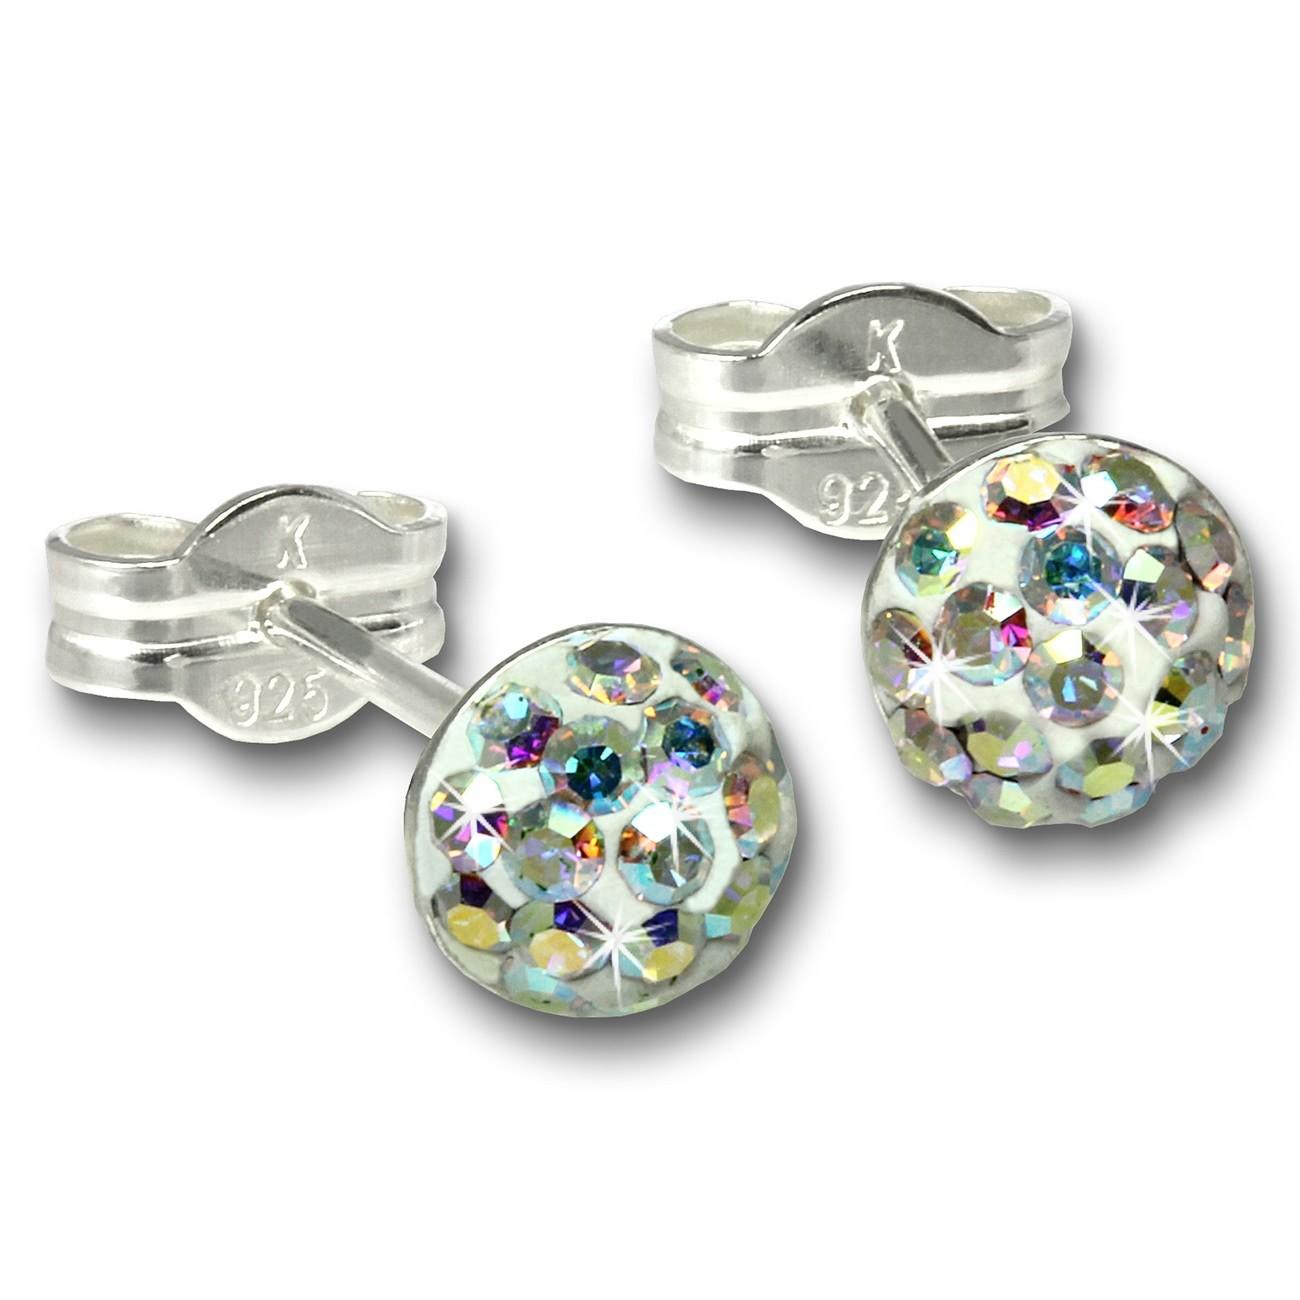 SilberDream Ohrstecker Halbkugel kristall Glitzer Kristalle GSO221Z